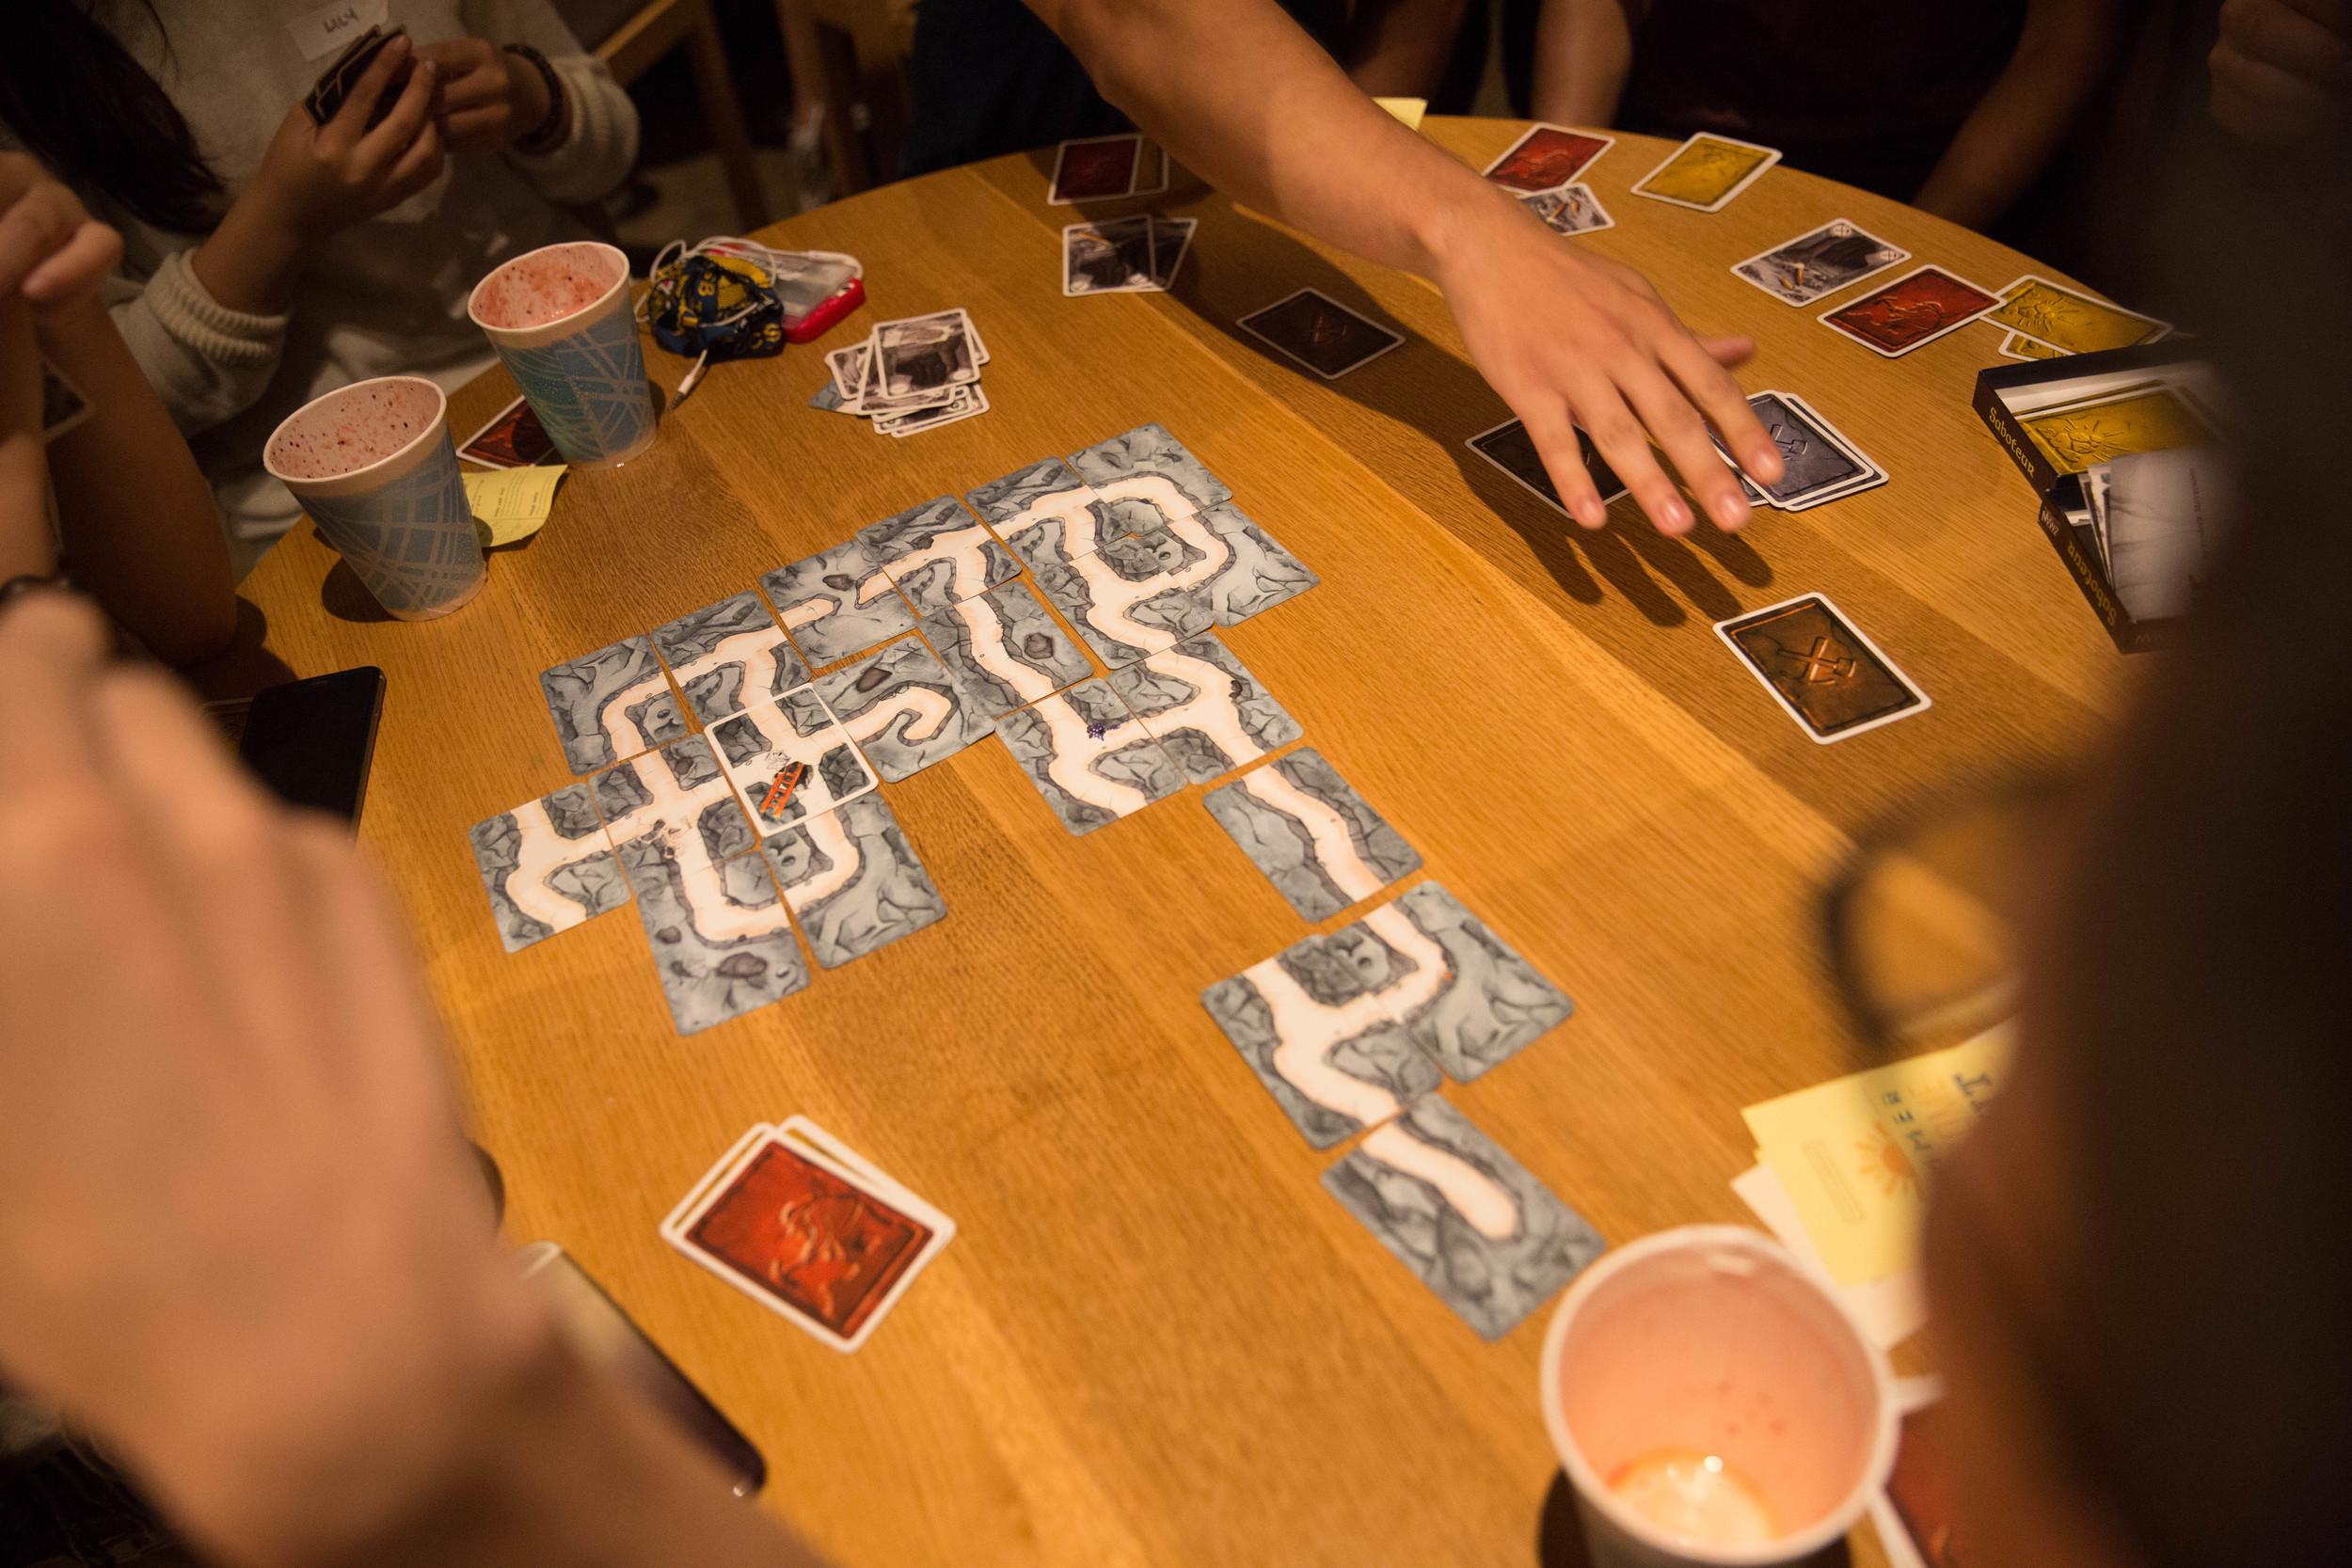 Smoothies & Boardgames